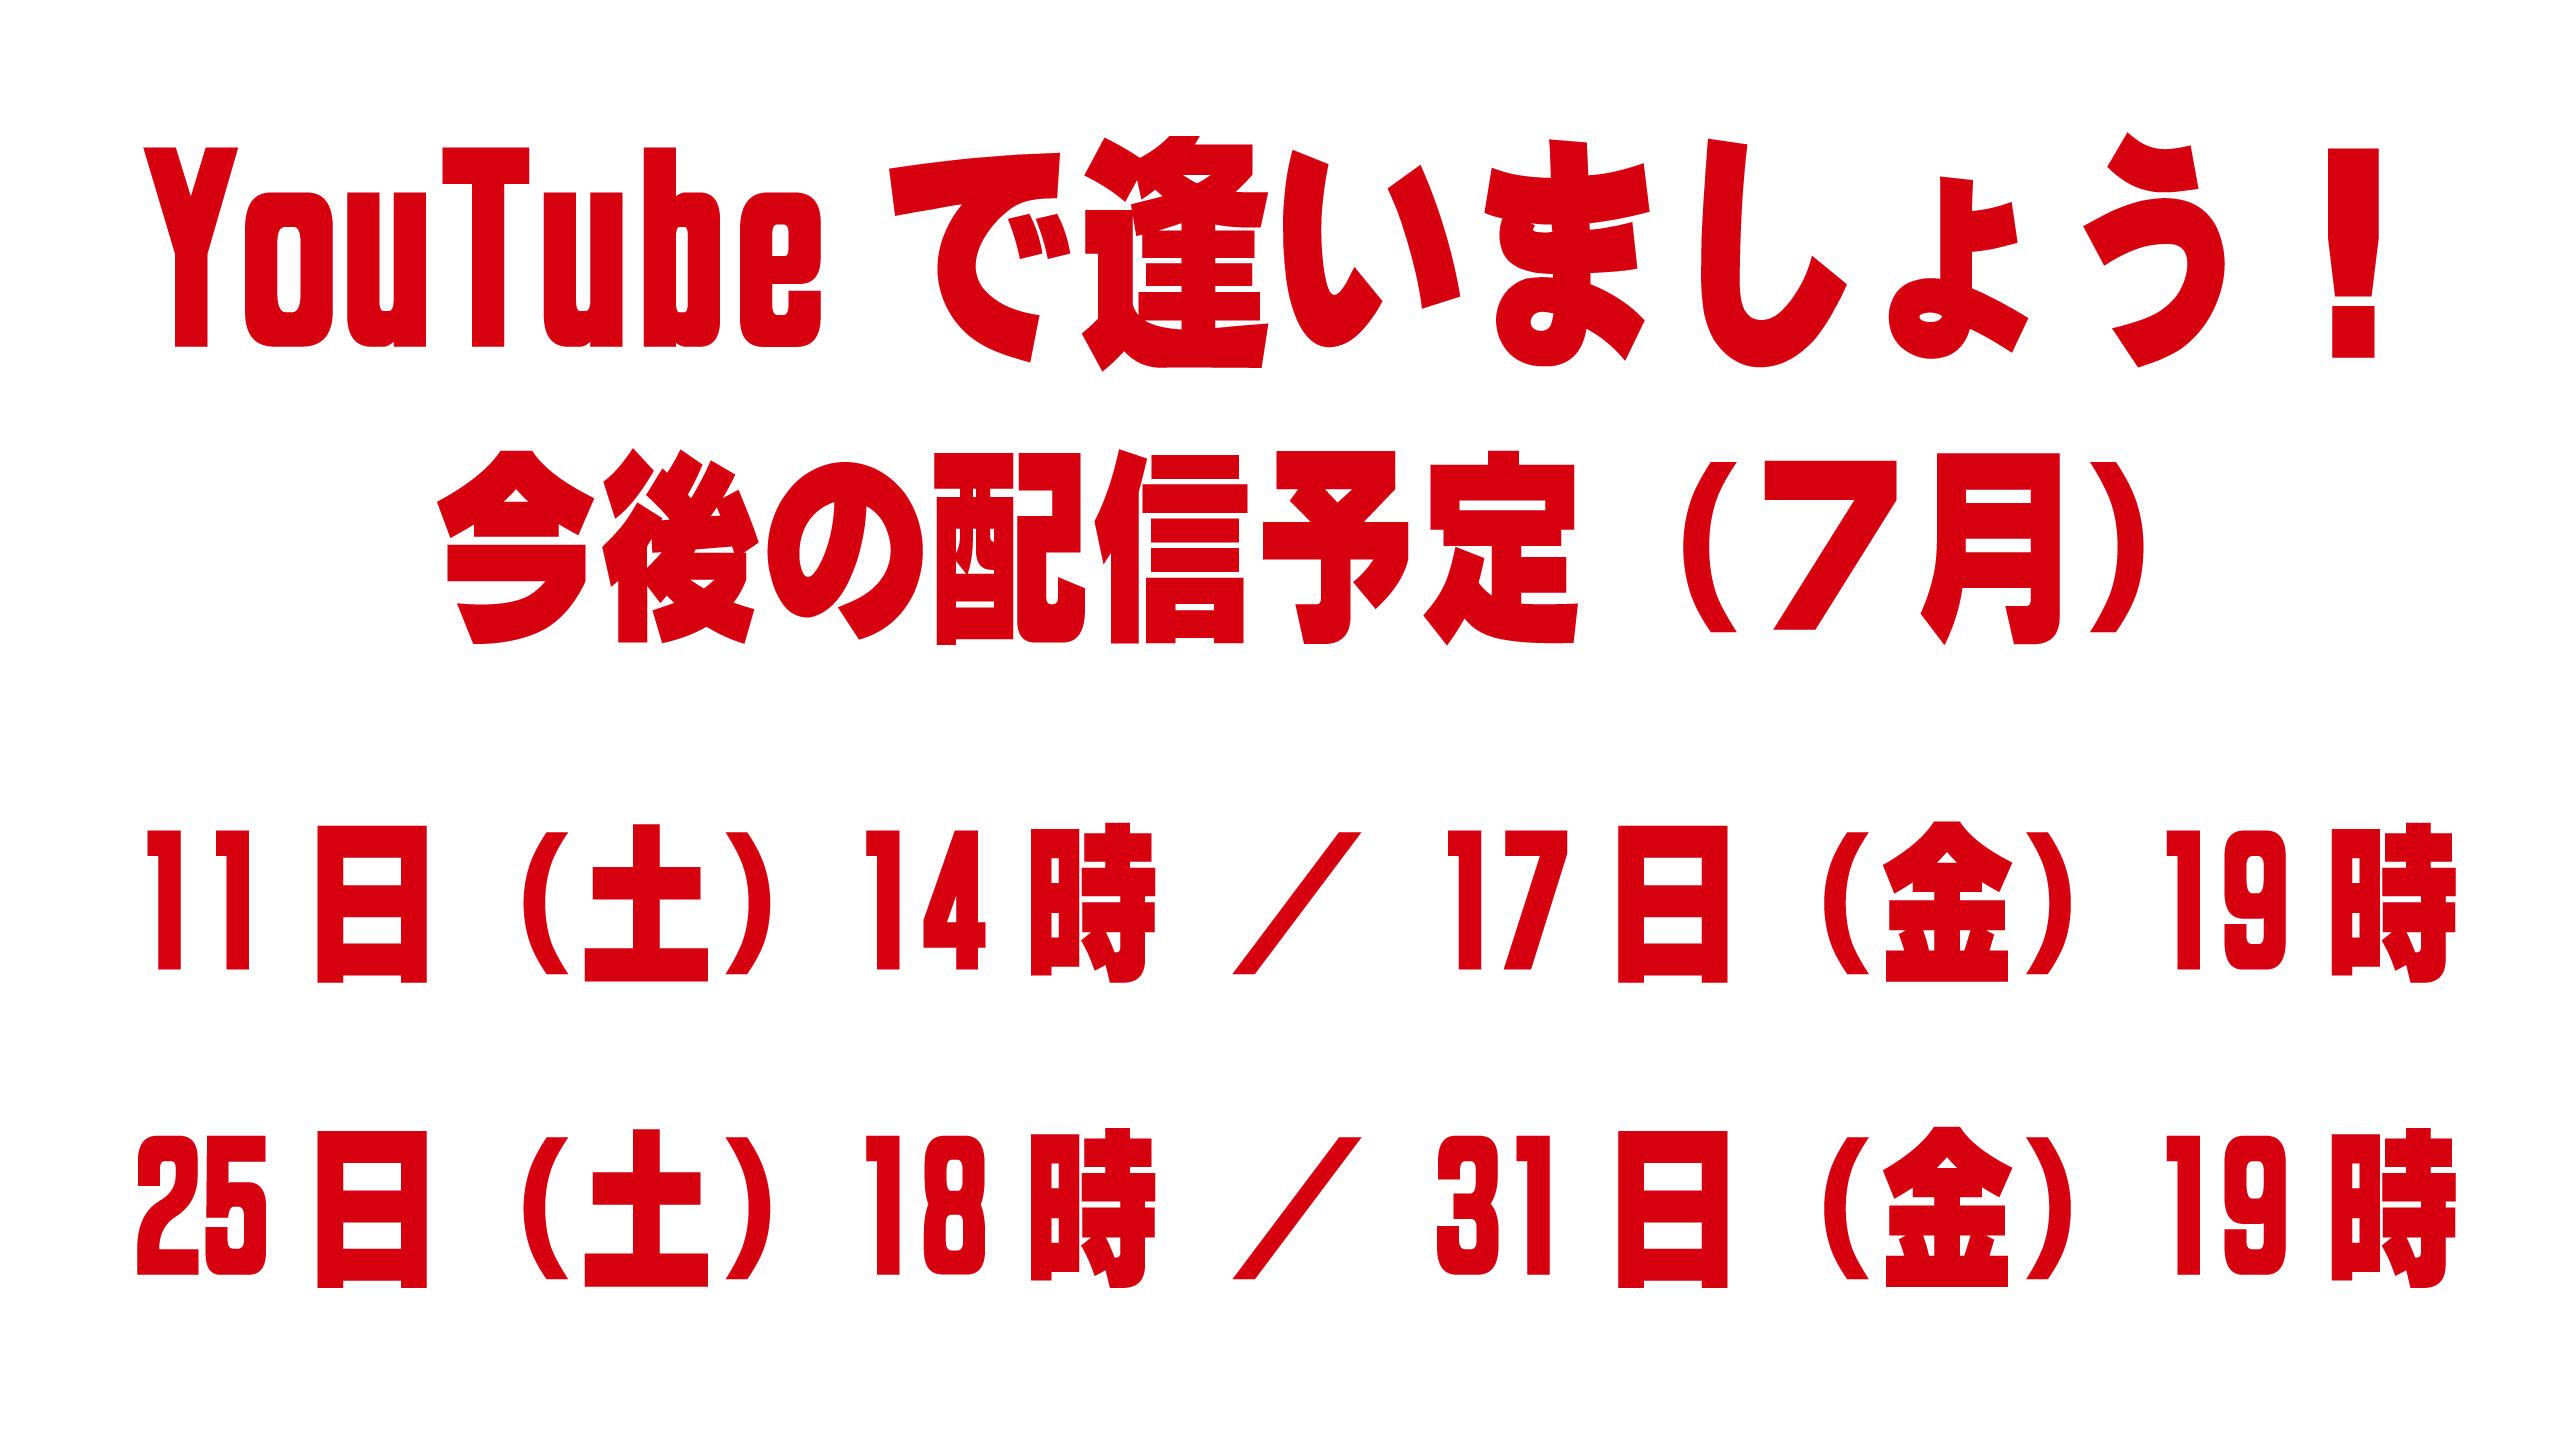 YouTubeで逢いましょう!の今後の配信予定